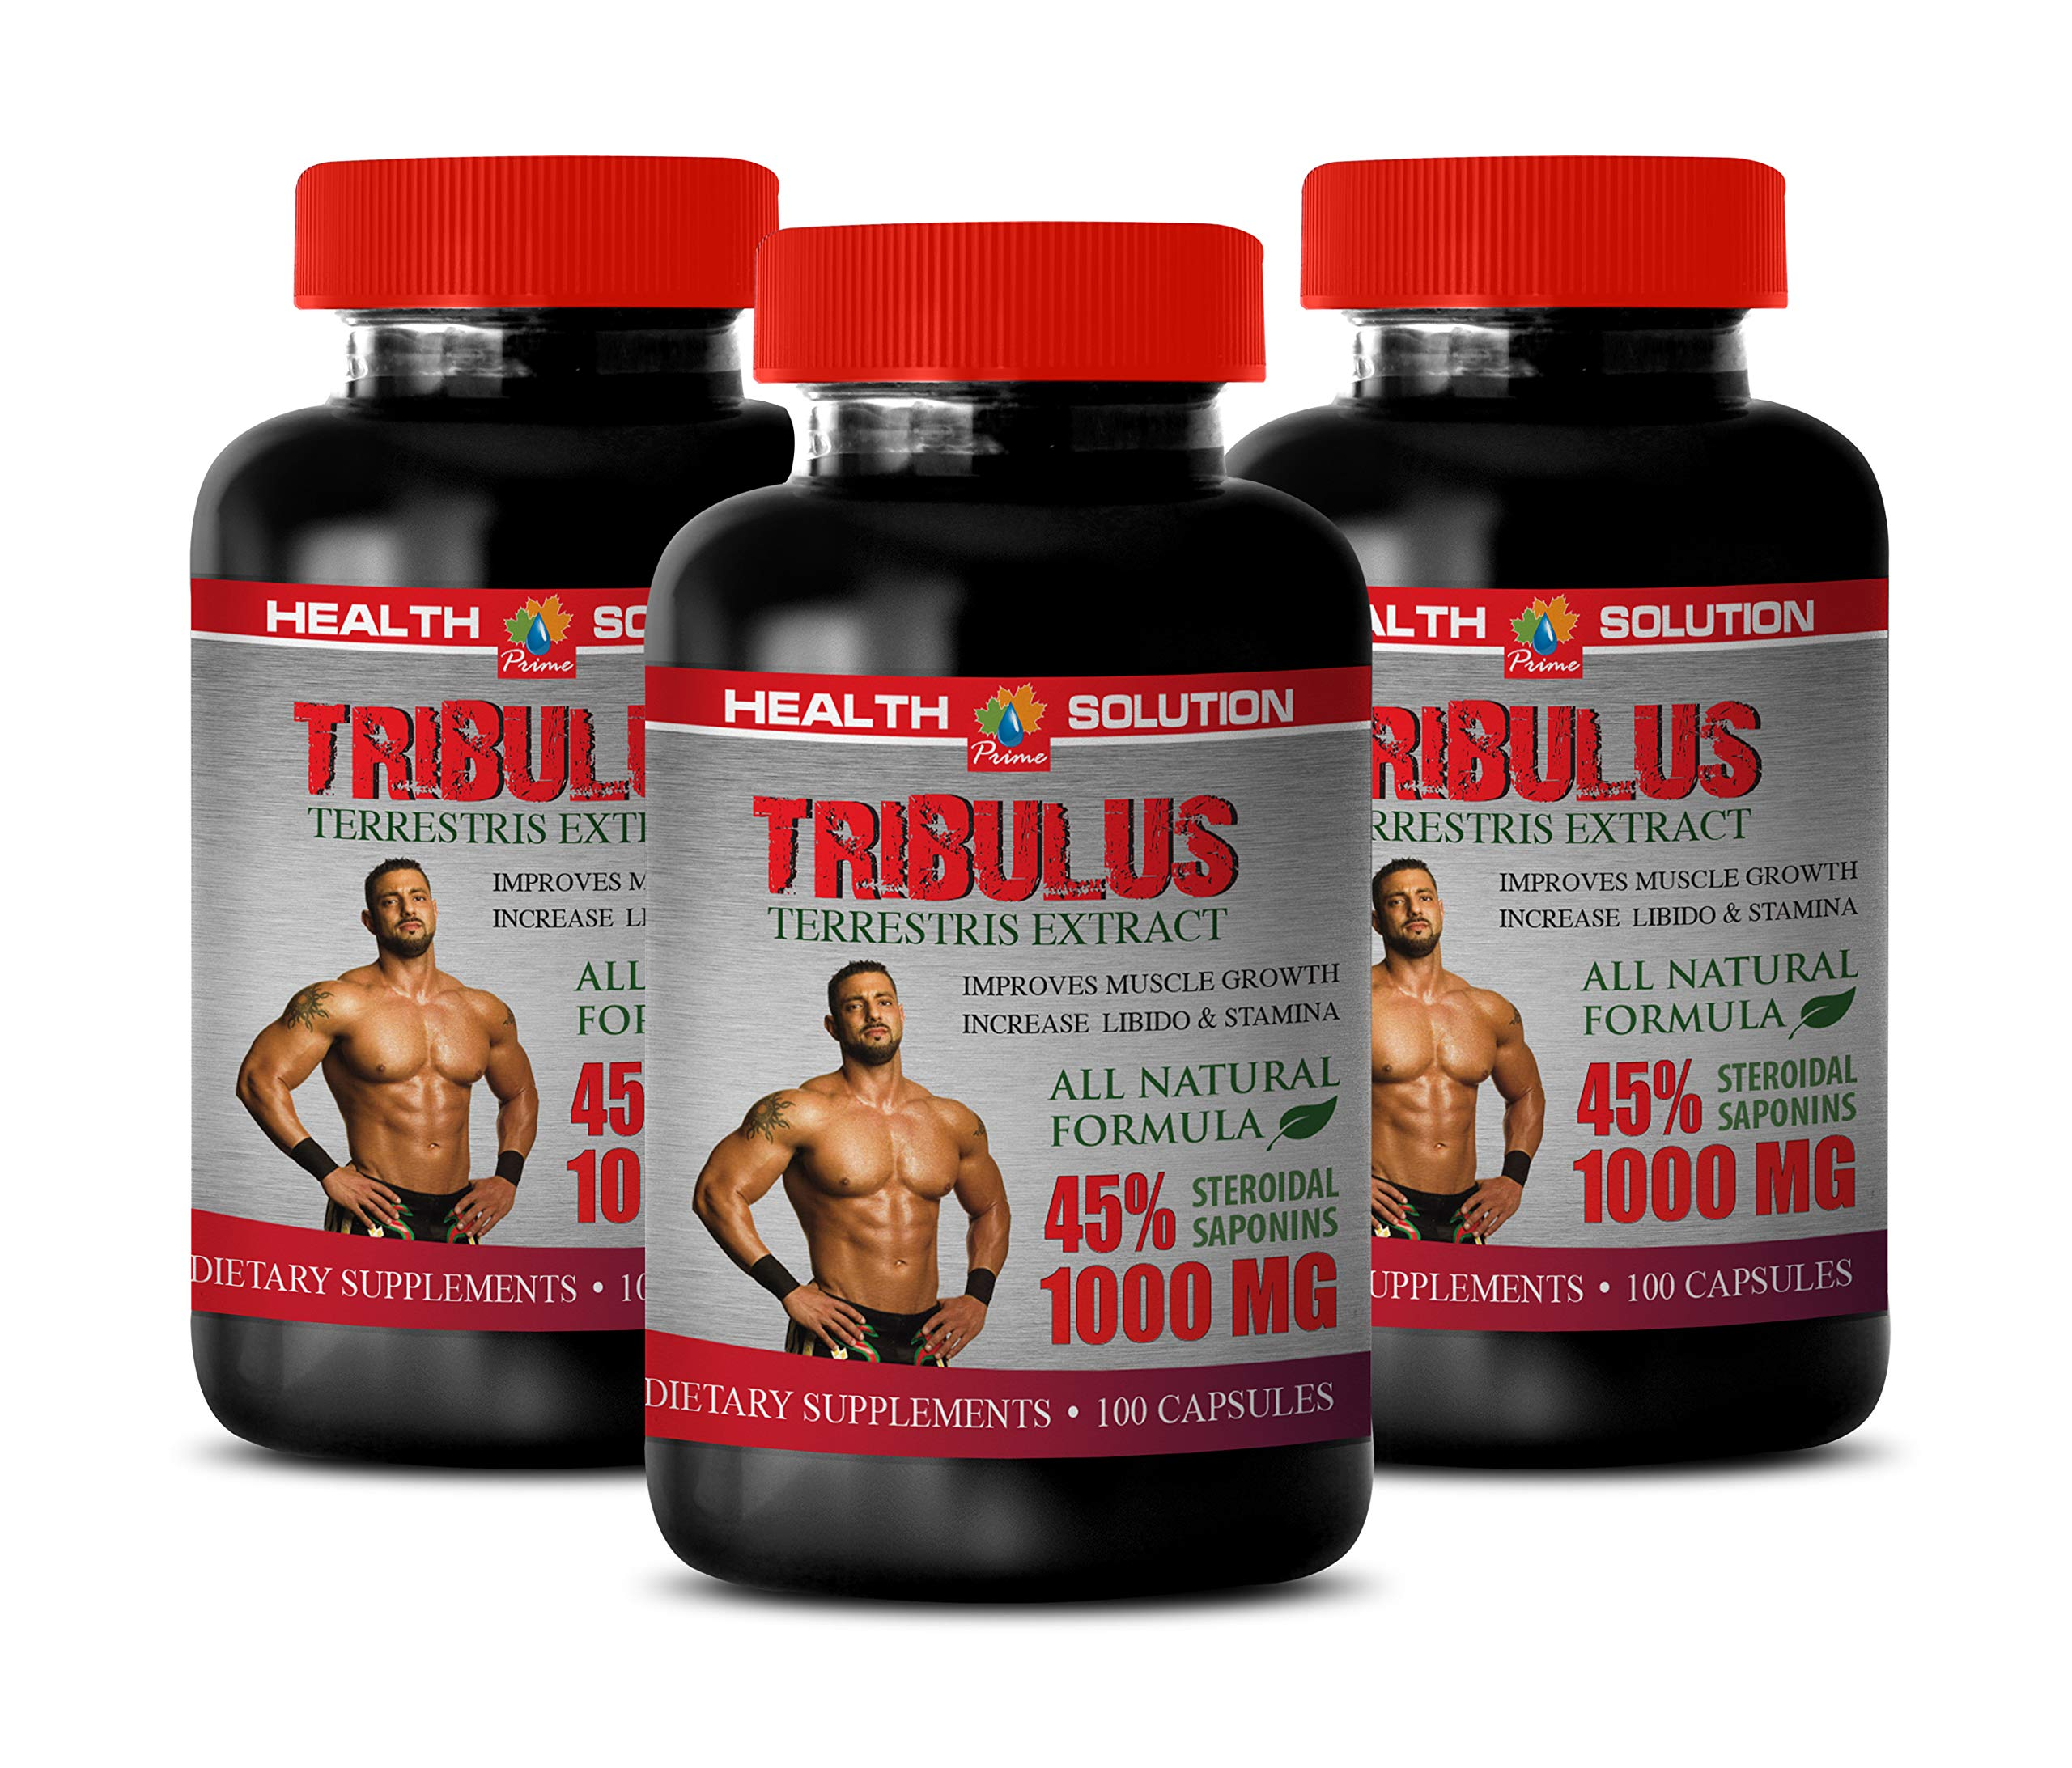 Muscle Maker Pills - TRIBULUS TERRESTRIS 1000MG - 45% STEROIDAL SAPONINS - tribulus - 3 Bottles (300 Capsules)